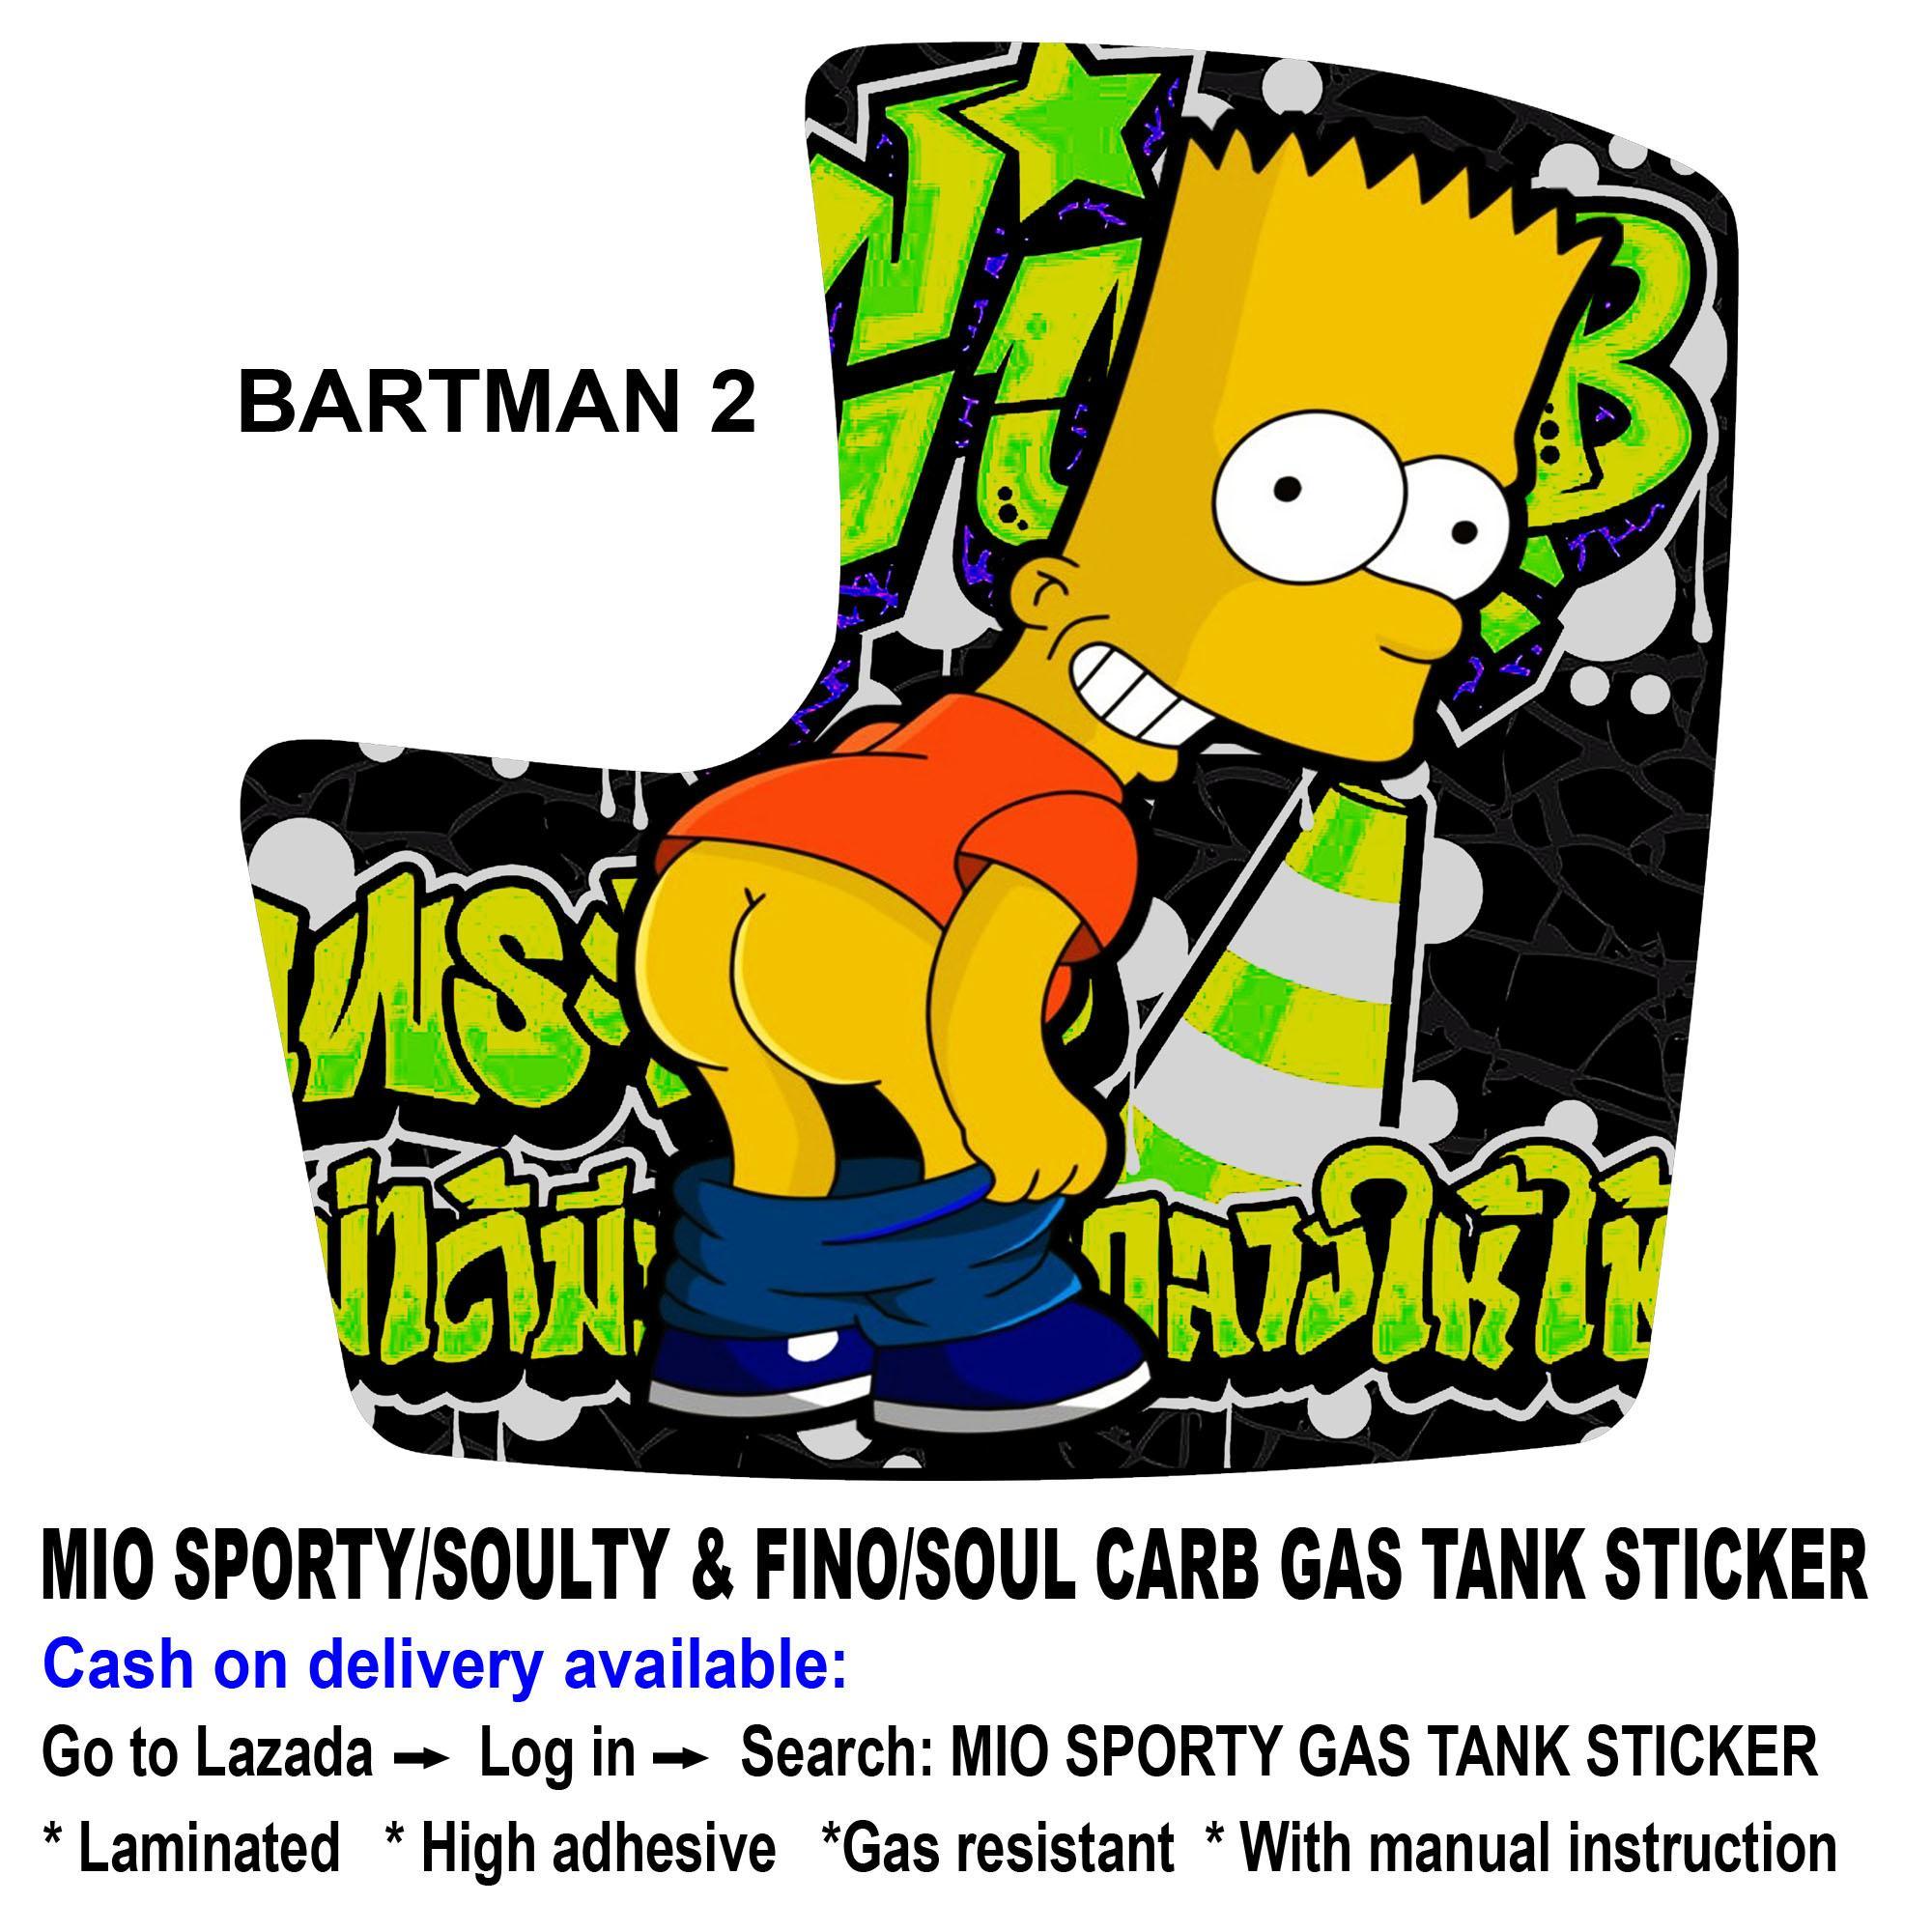 Mio sporty gas tank sticker bartman 2